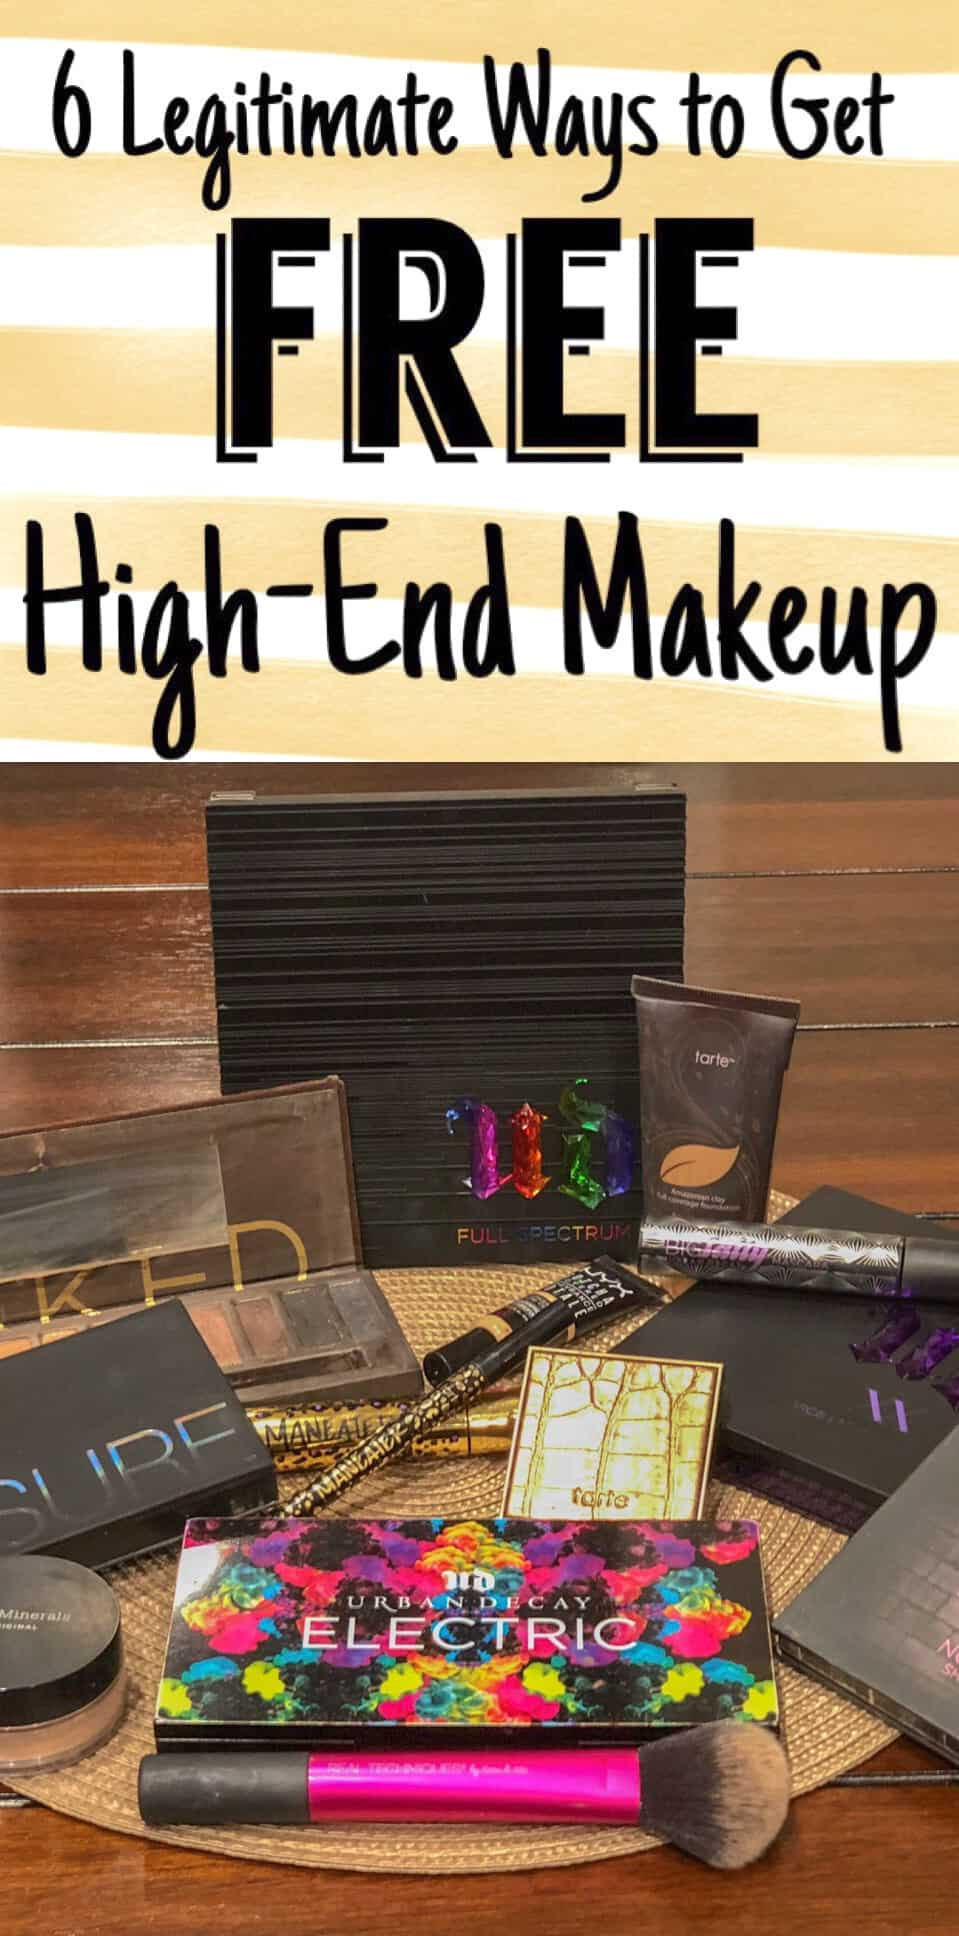 Free high-end makeup (Urban Decay, Tarte, Smashbox)